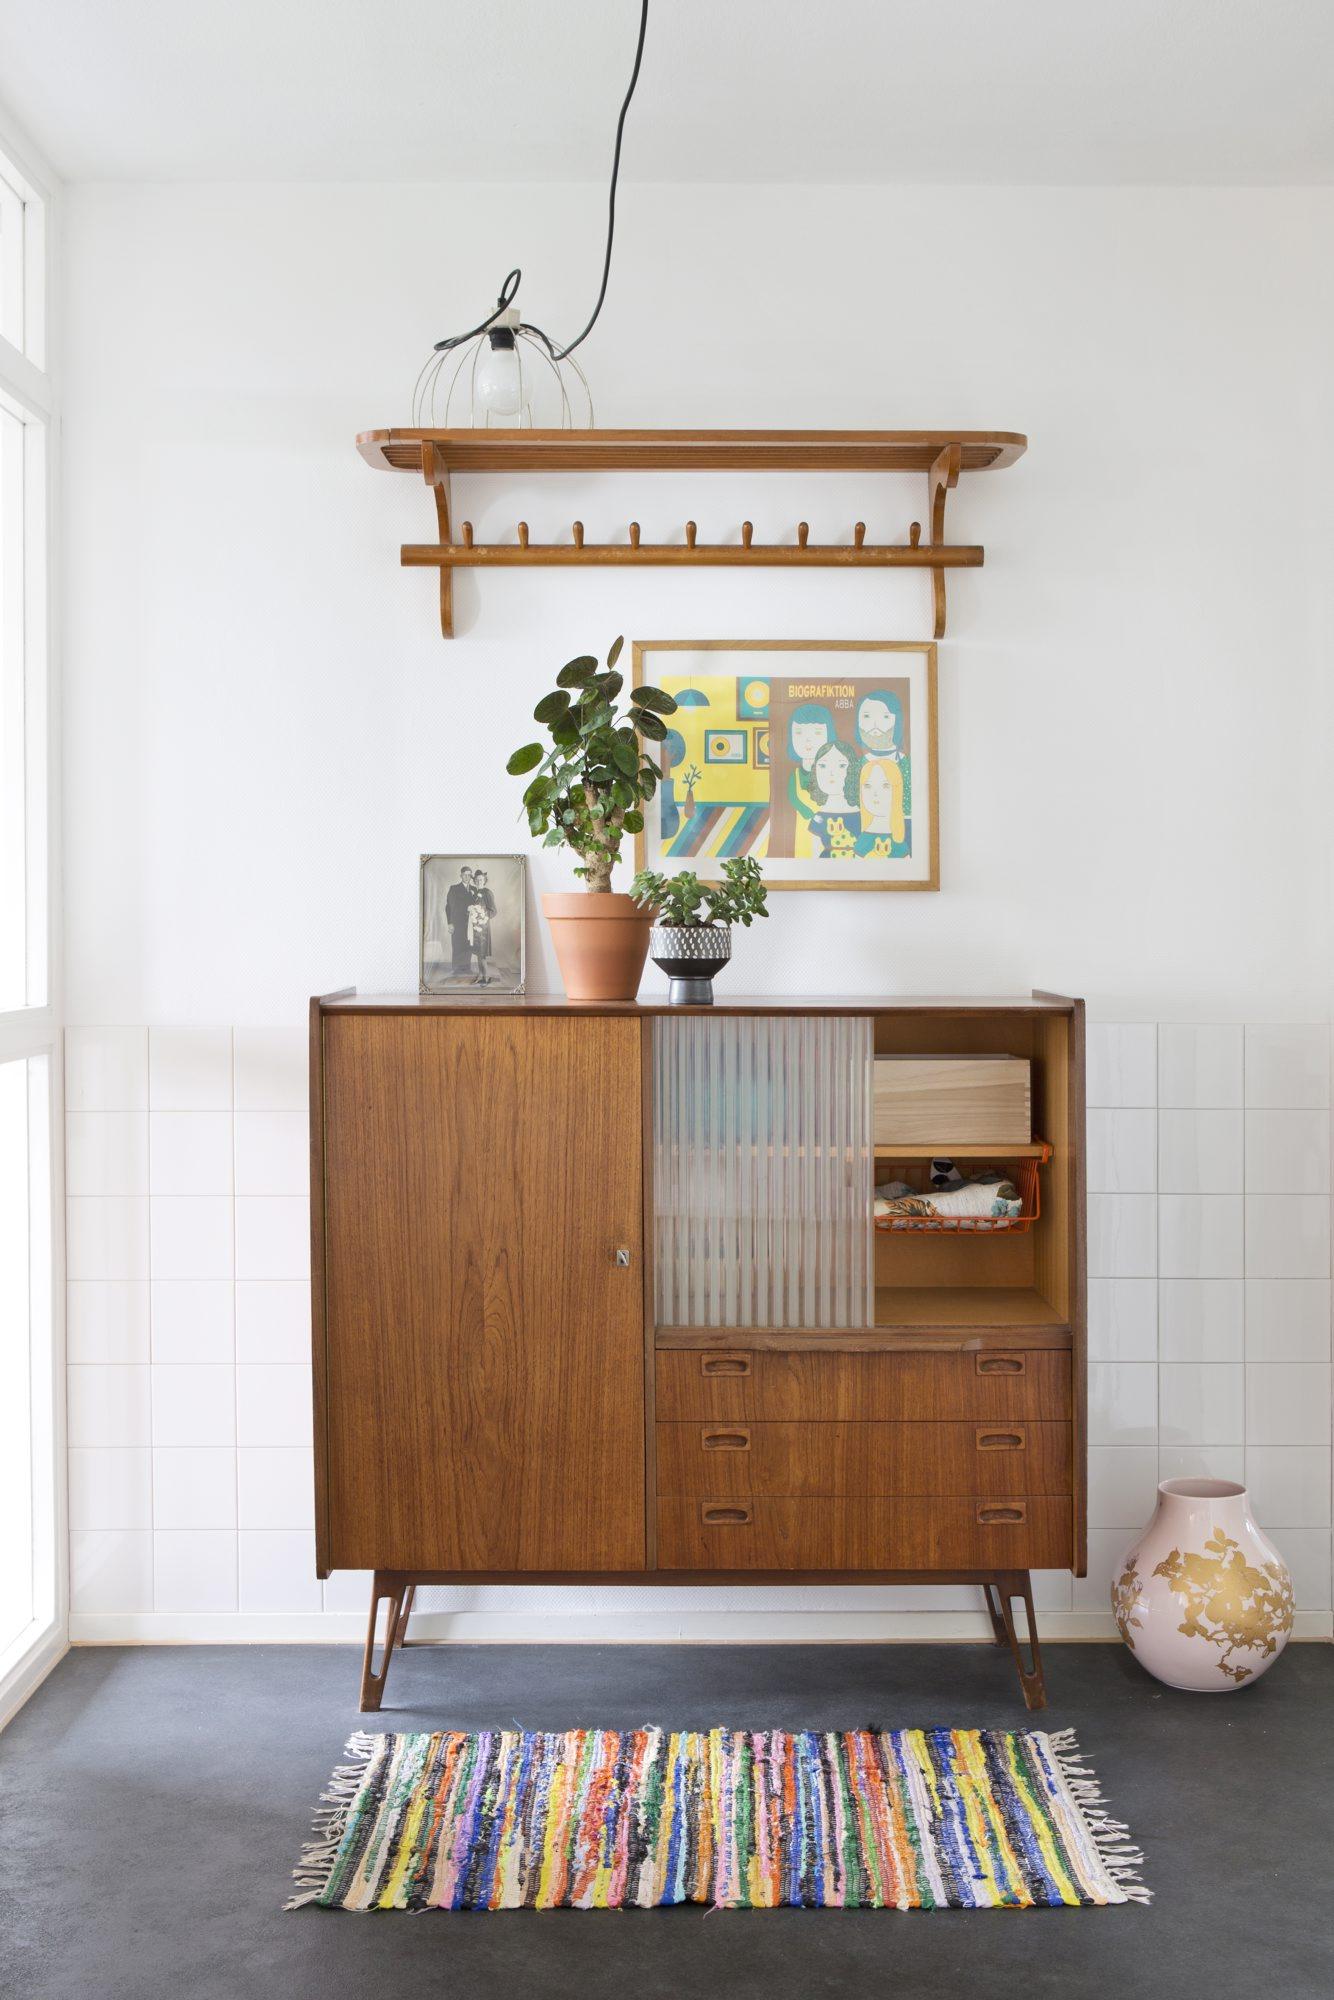 Gang med vintagestil. Bruk et gammelt møbel til oppbevaring.